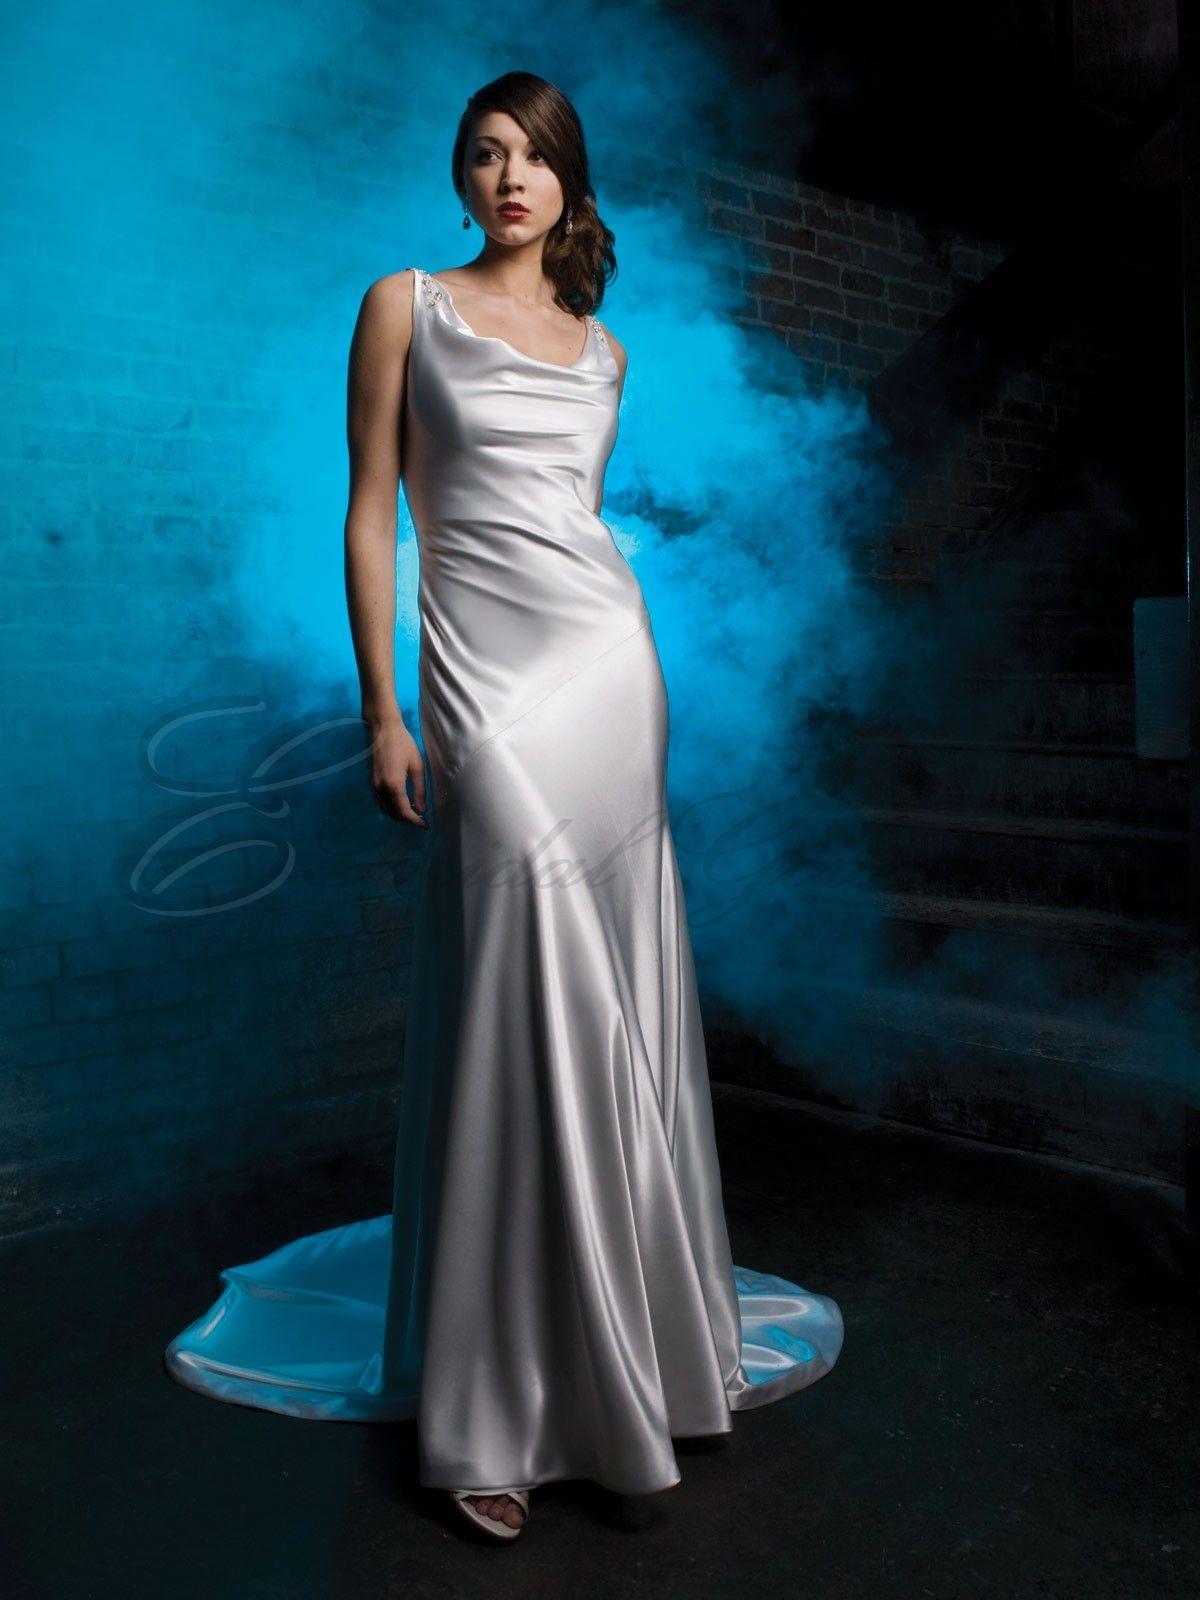 Silk charmeuse slip wedding dress 2016 a line charmeuse bias cut silk charmeuse slip wedding dress 2016 a line charmeuse bias cut slip bodice back ombrellifo Gallery